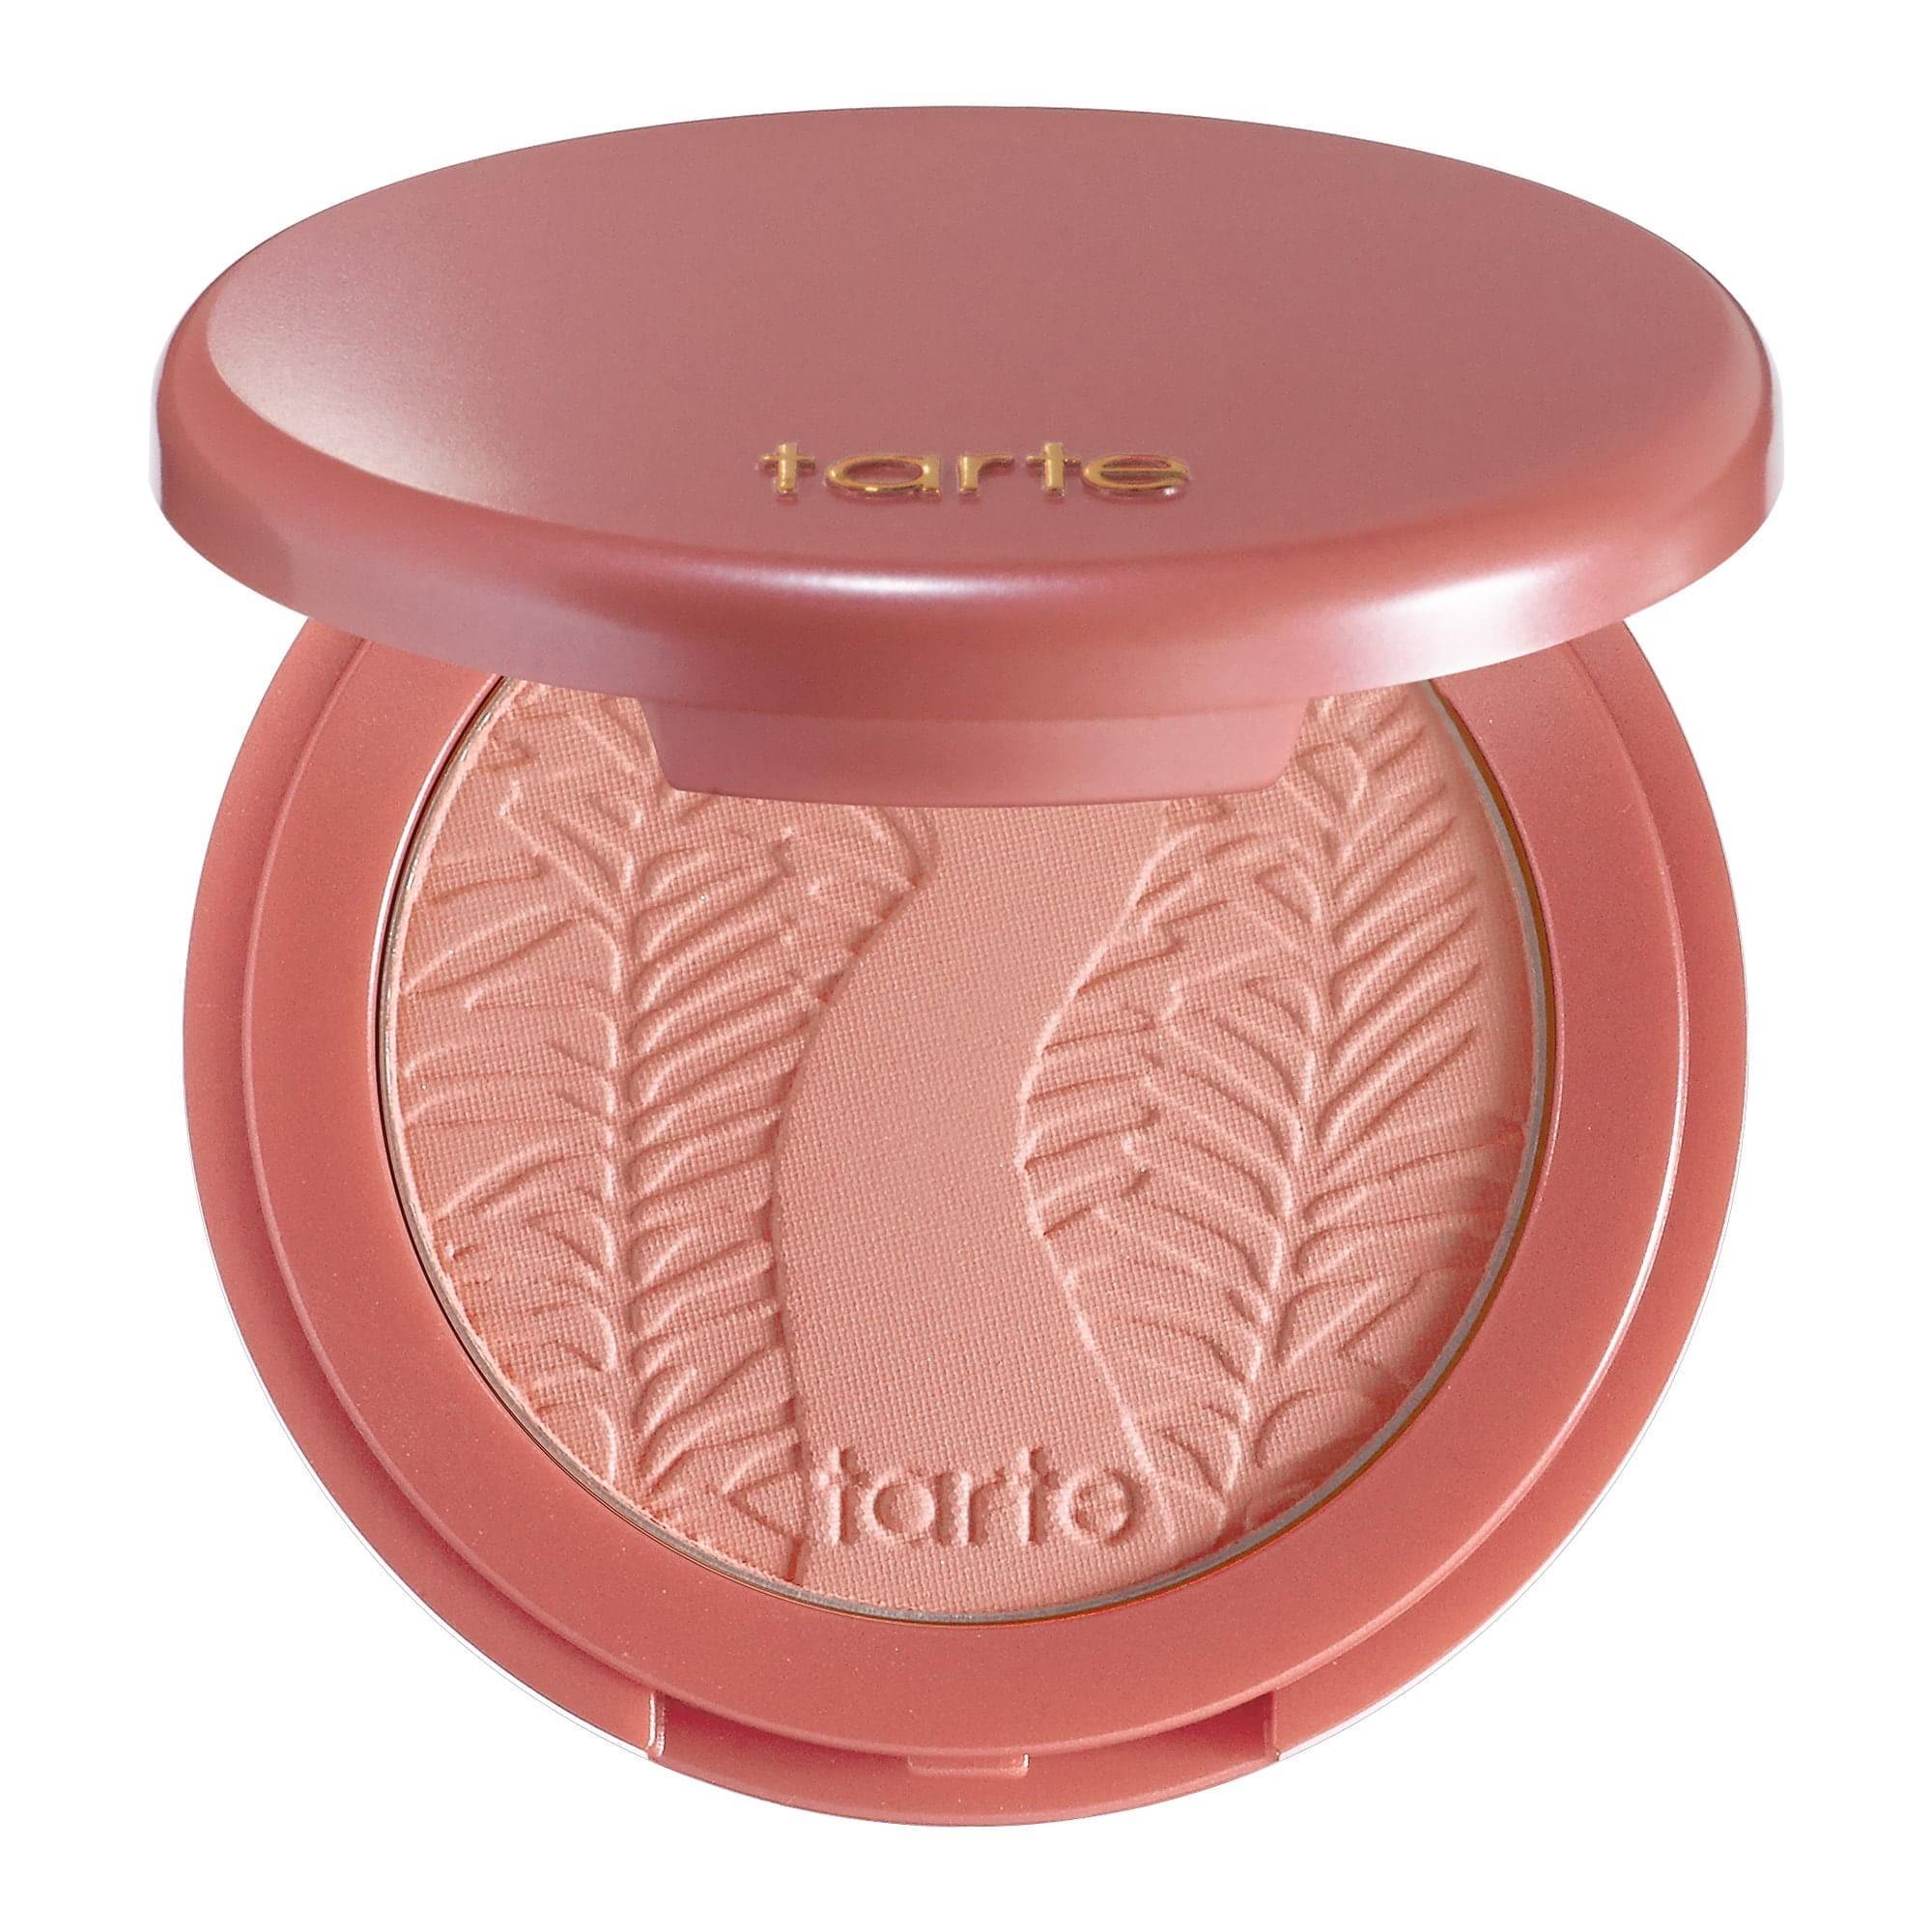 Tarte Amazonian clay 12-hour blush Exposed